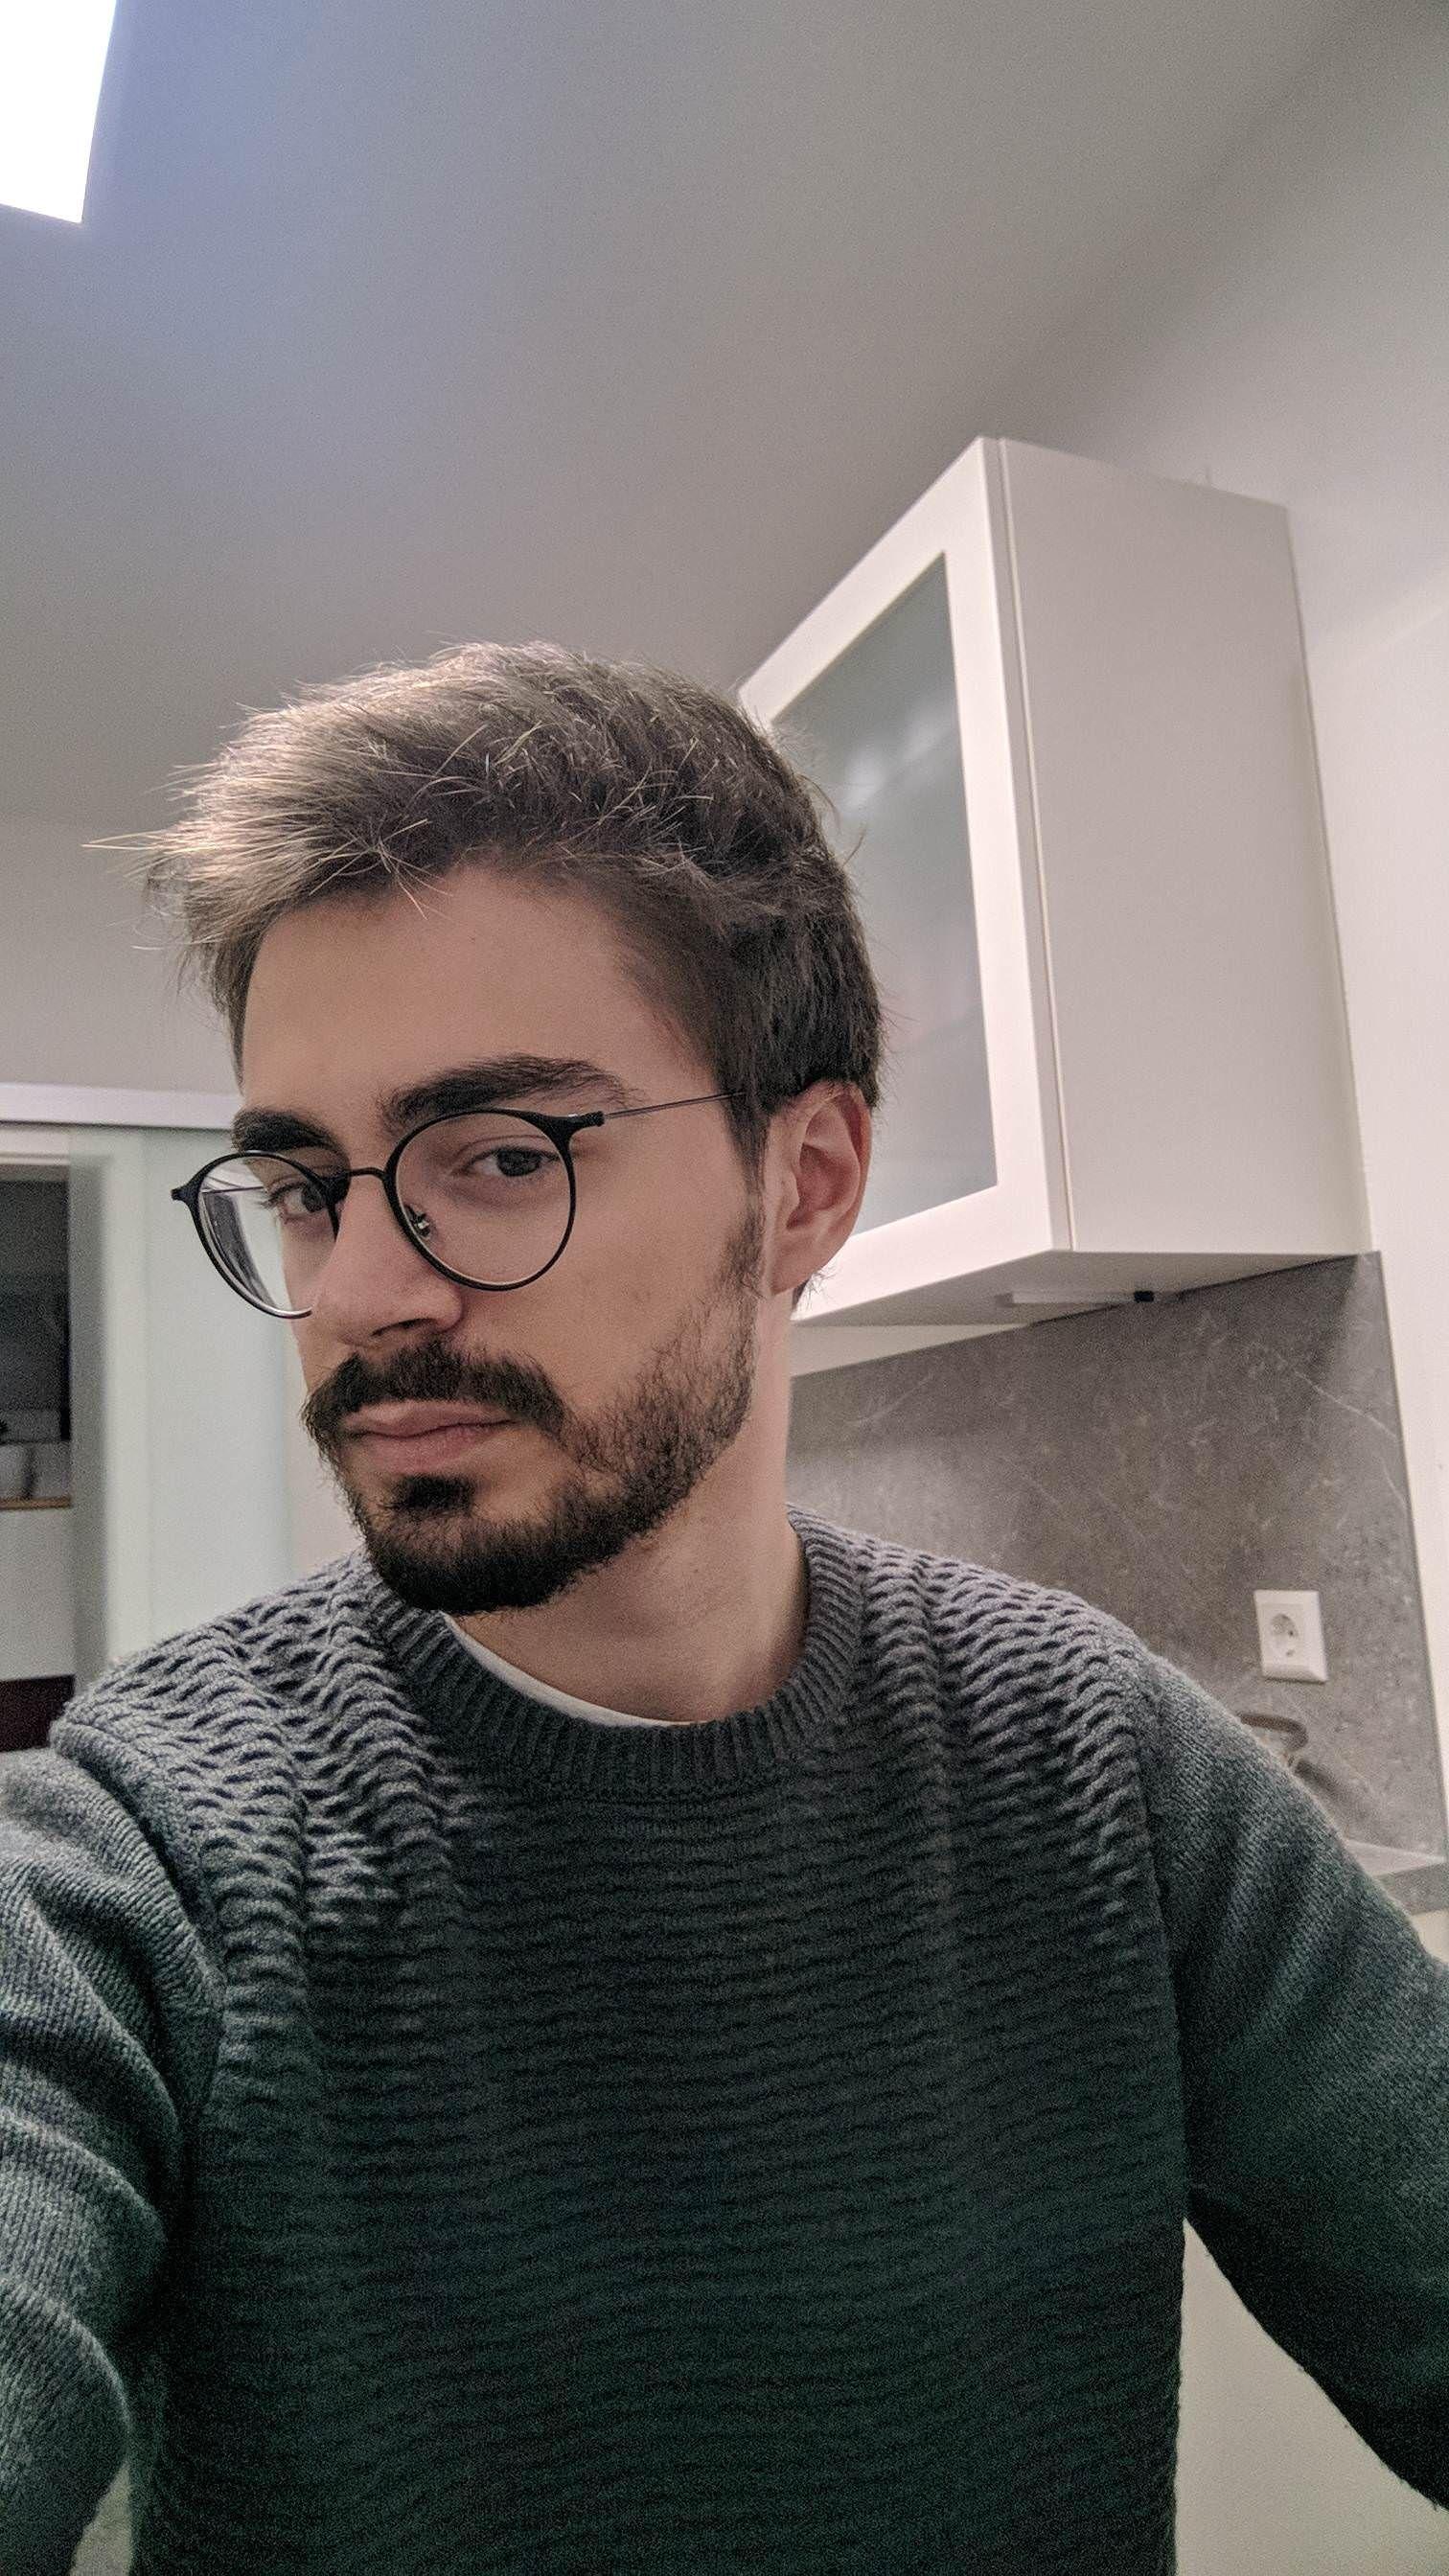 How To Grow A Beard Top Beardbrand Styling Growing 2018